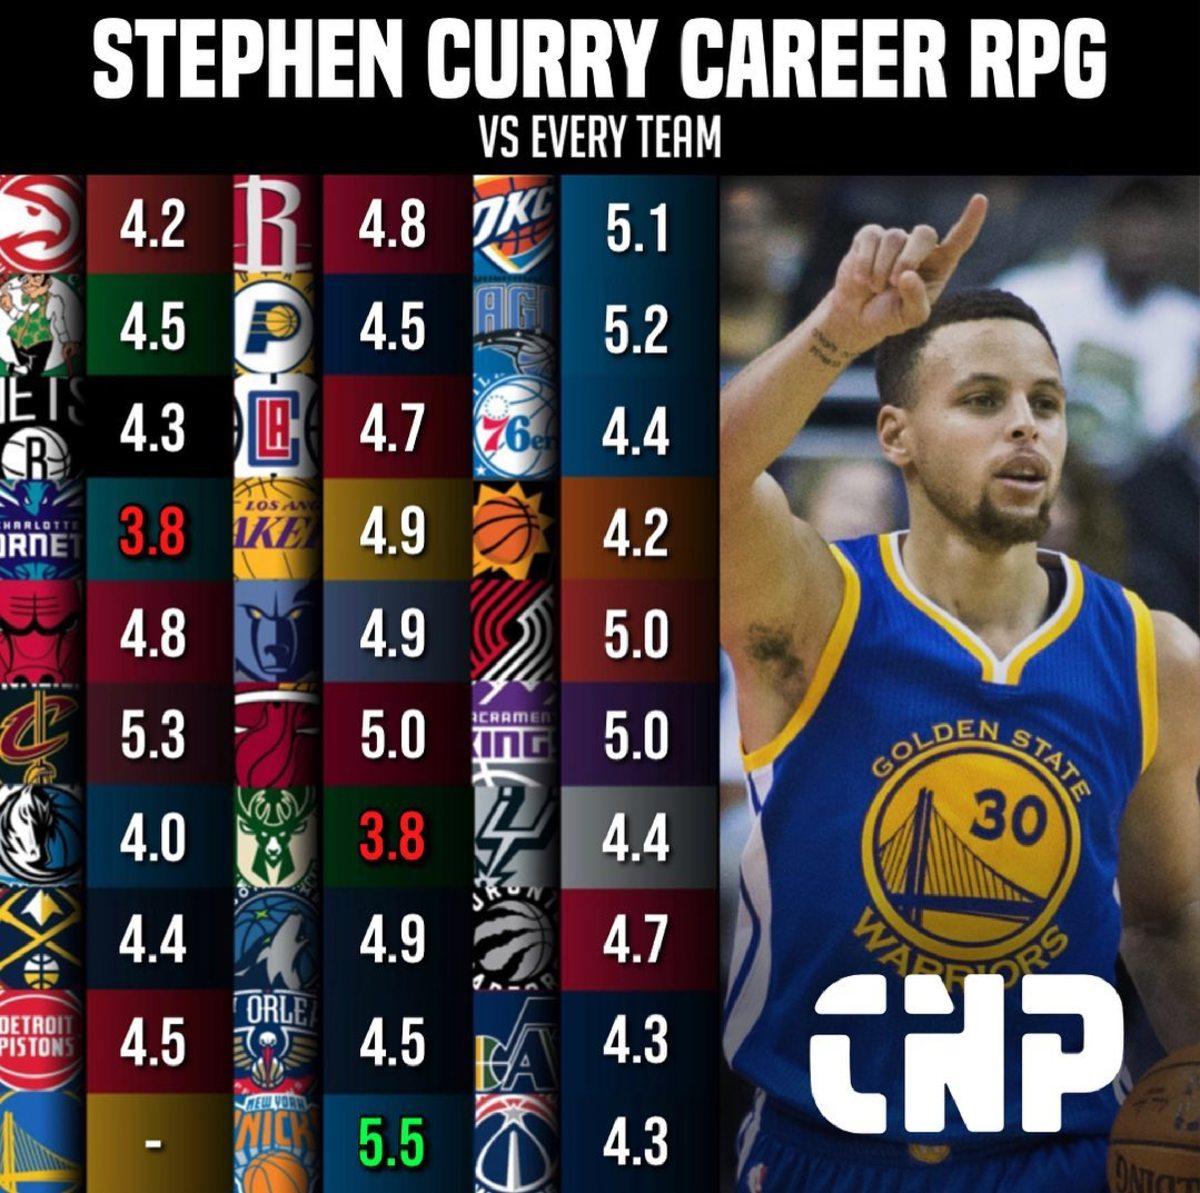 Stephen Curry Career RPG